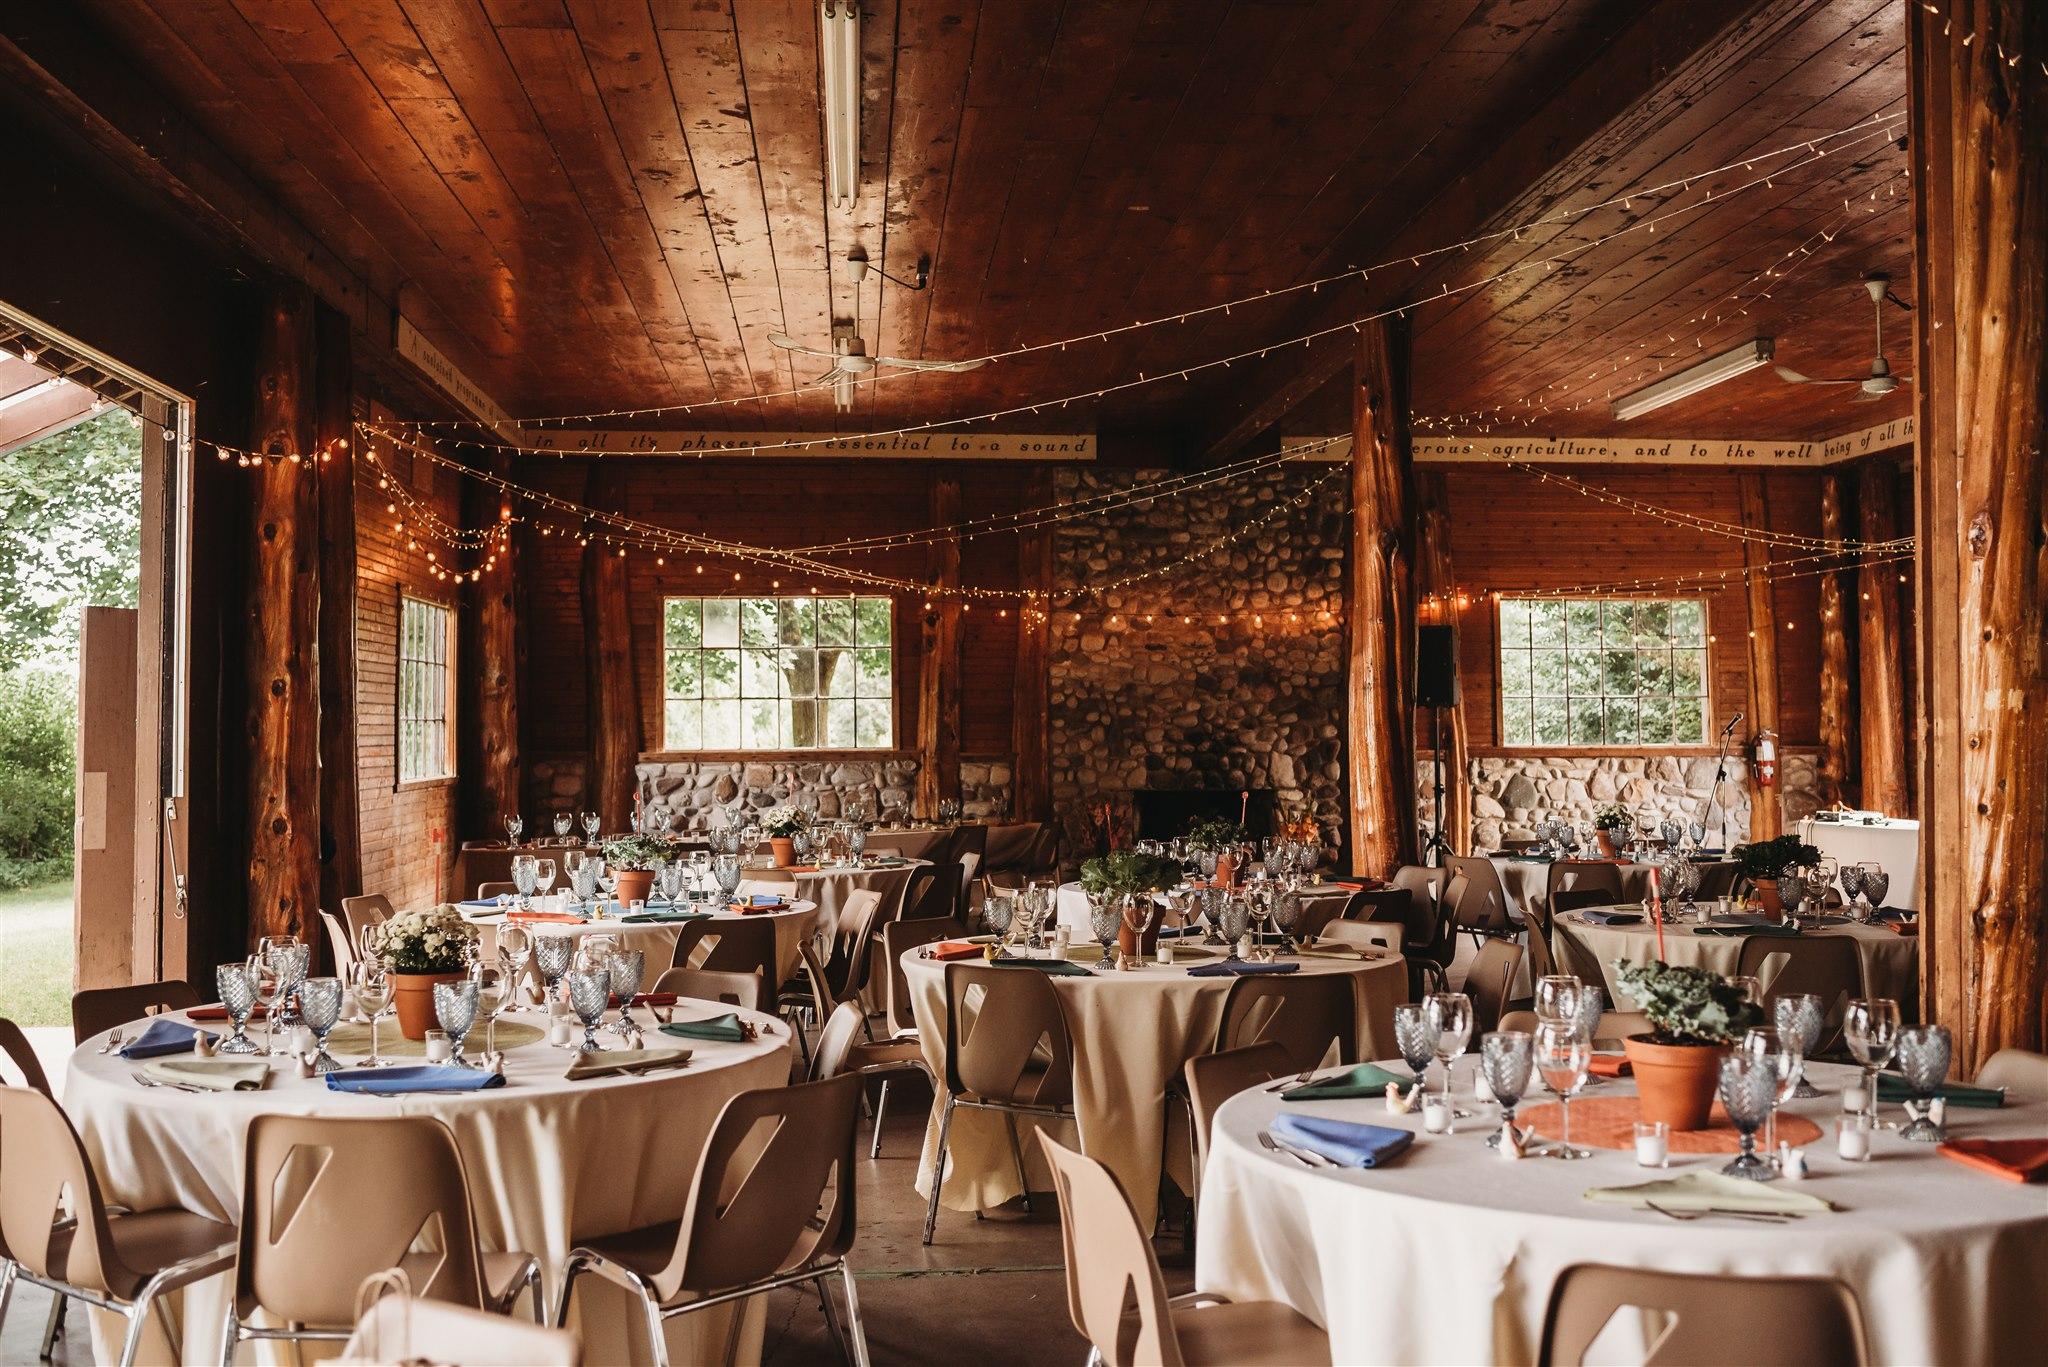 fanshawe conservation area wedding photos 251 1 - Watson Porter Pavillion Wedding